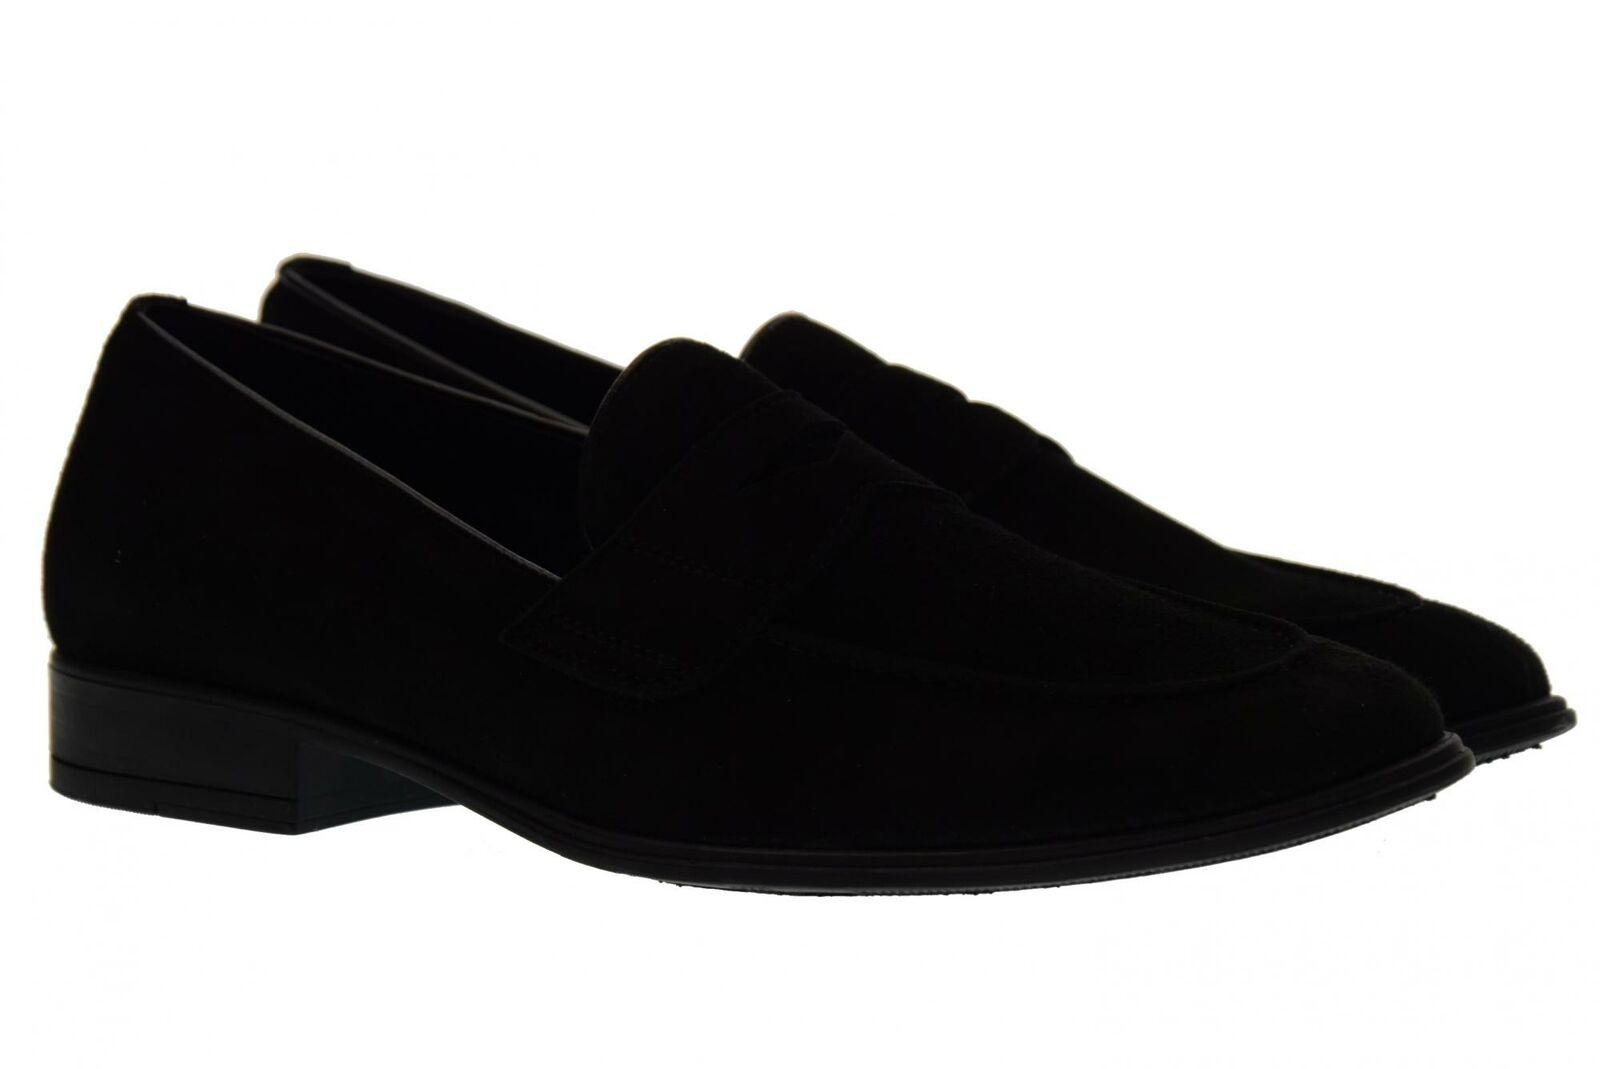 Antica Cuoieria P18u men's shoes moccasins 19763-A-S67 BLACK AMALFI